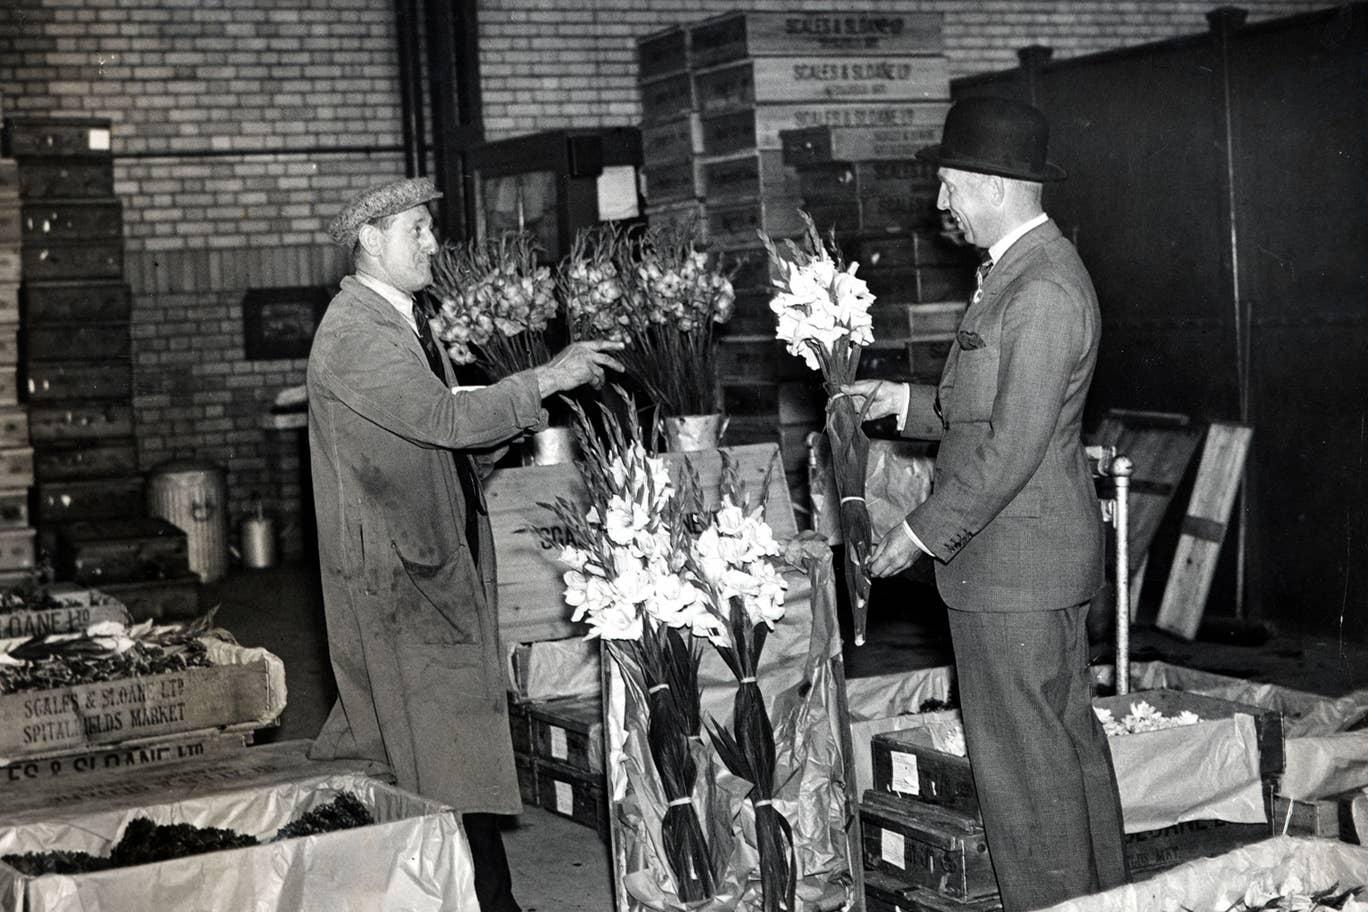 Businessmen buying flowers in spitalfields market